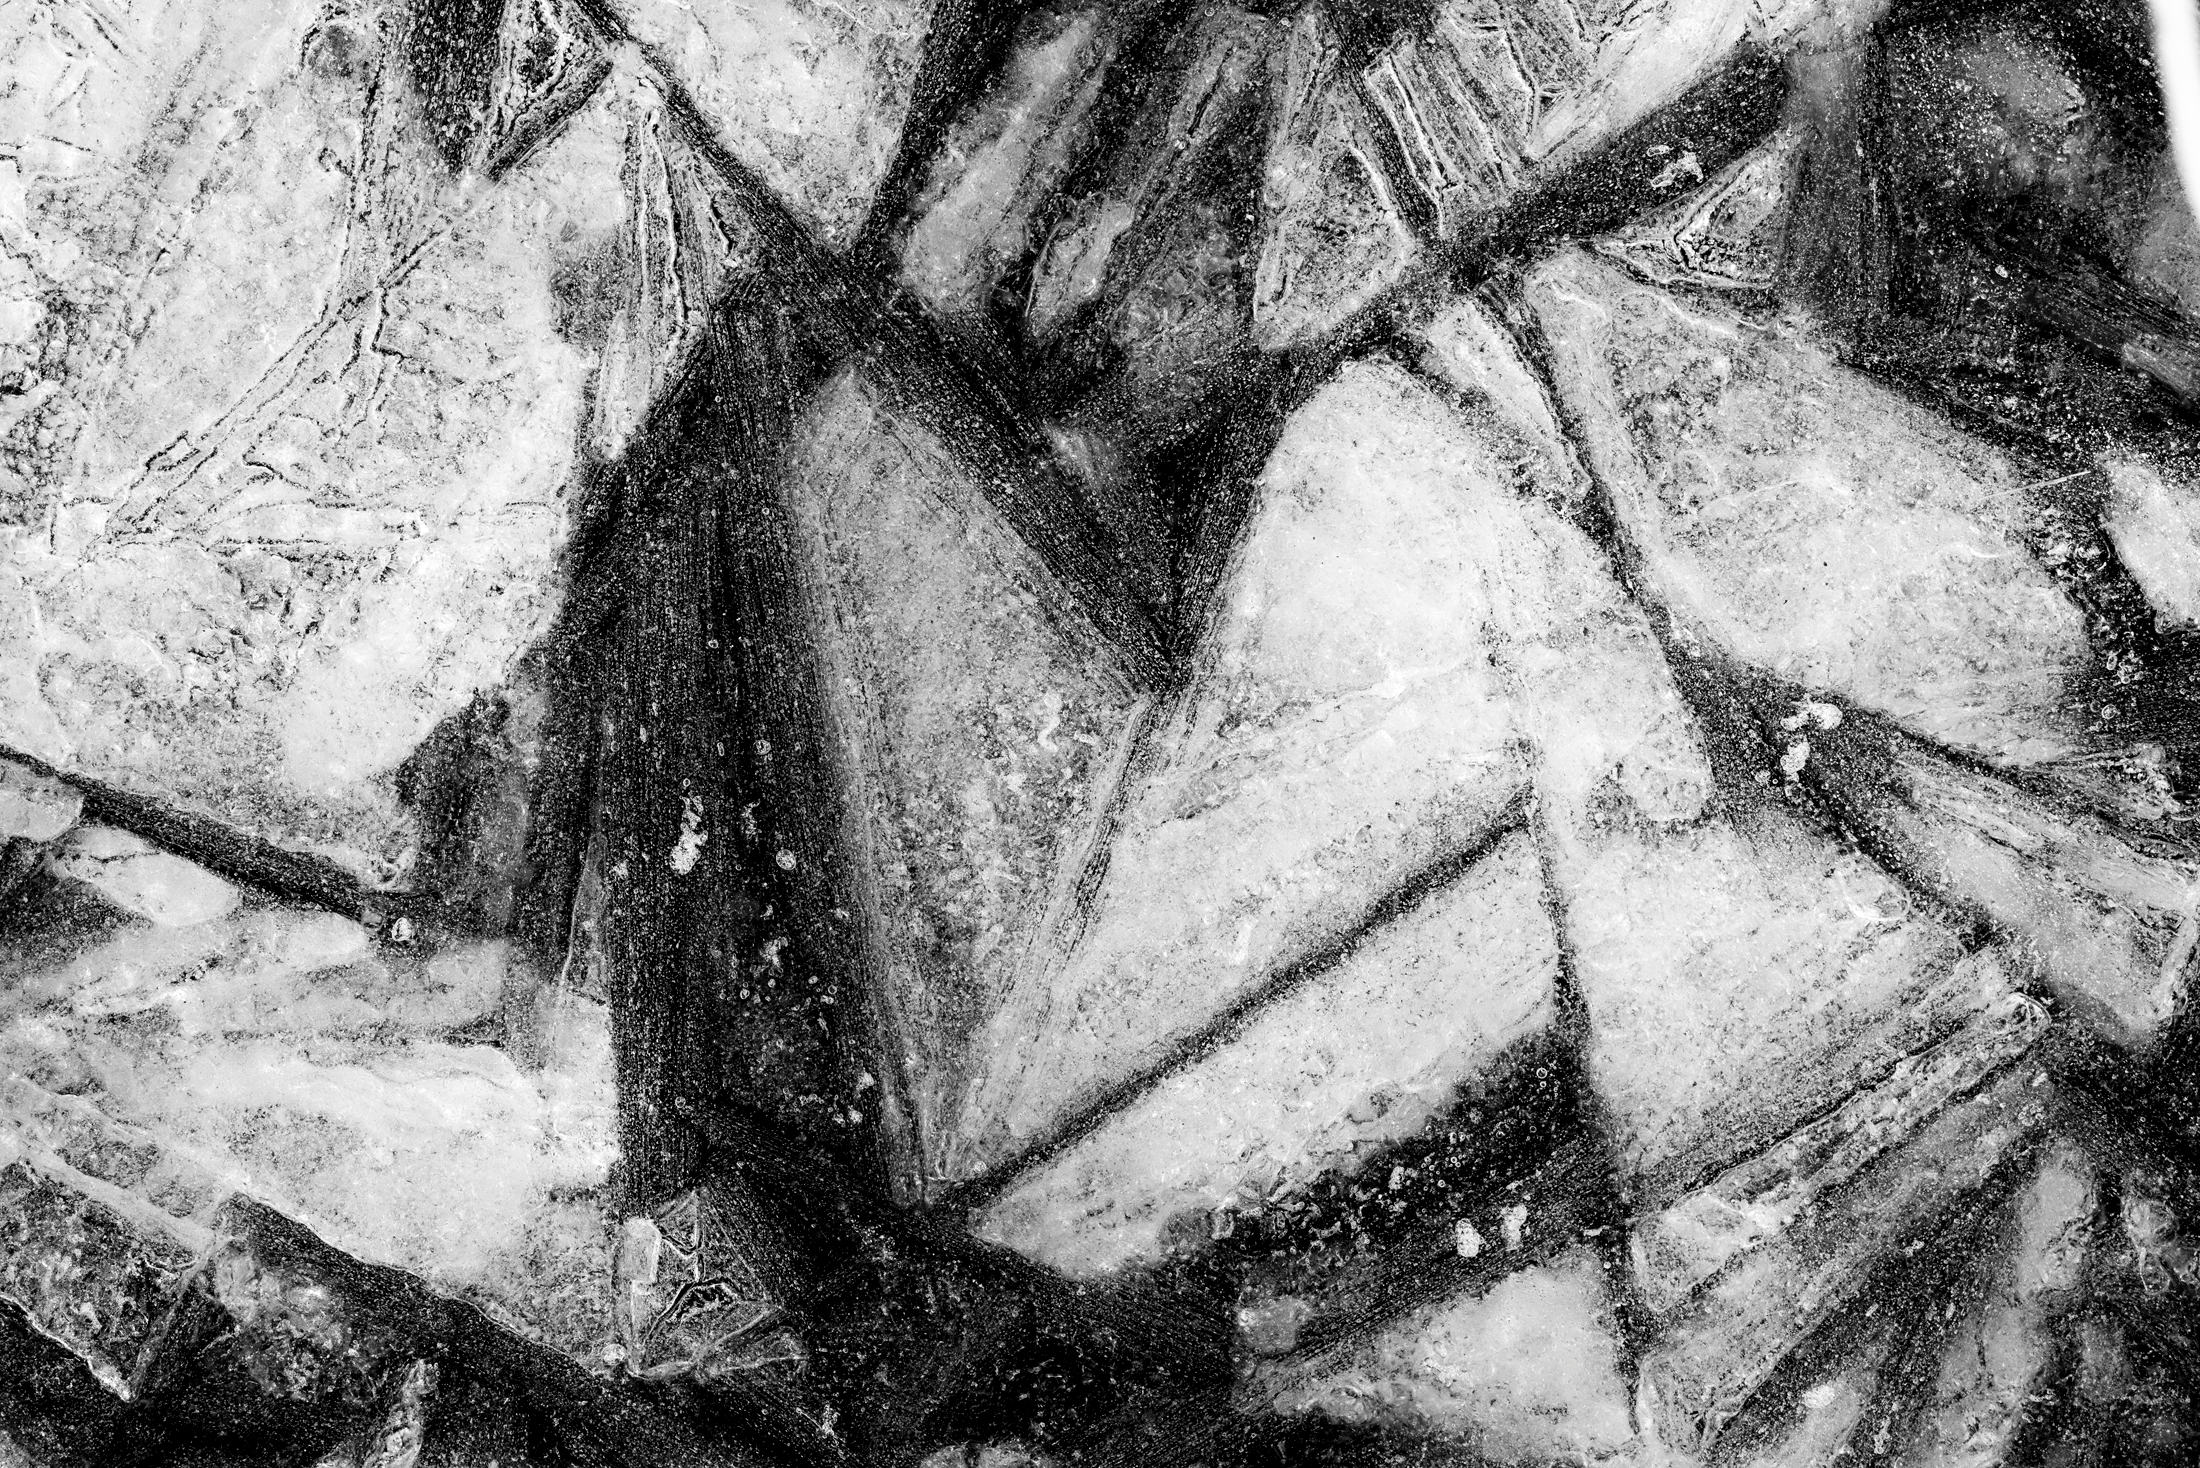 Abstract Ice Heart BW.jpg